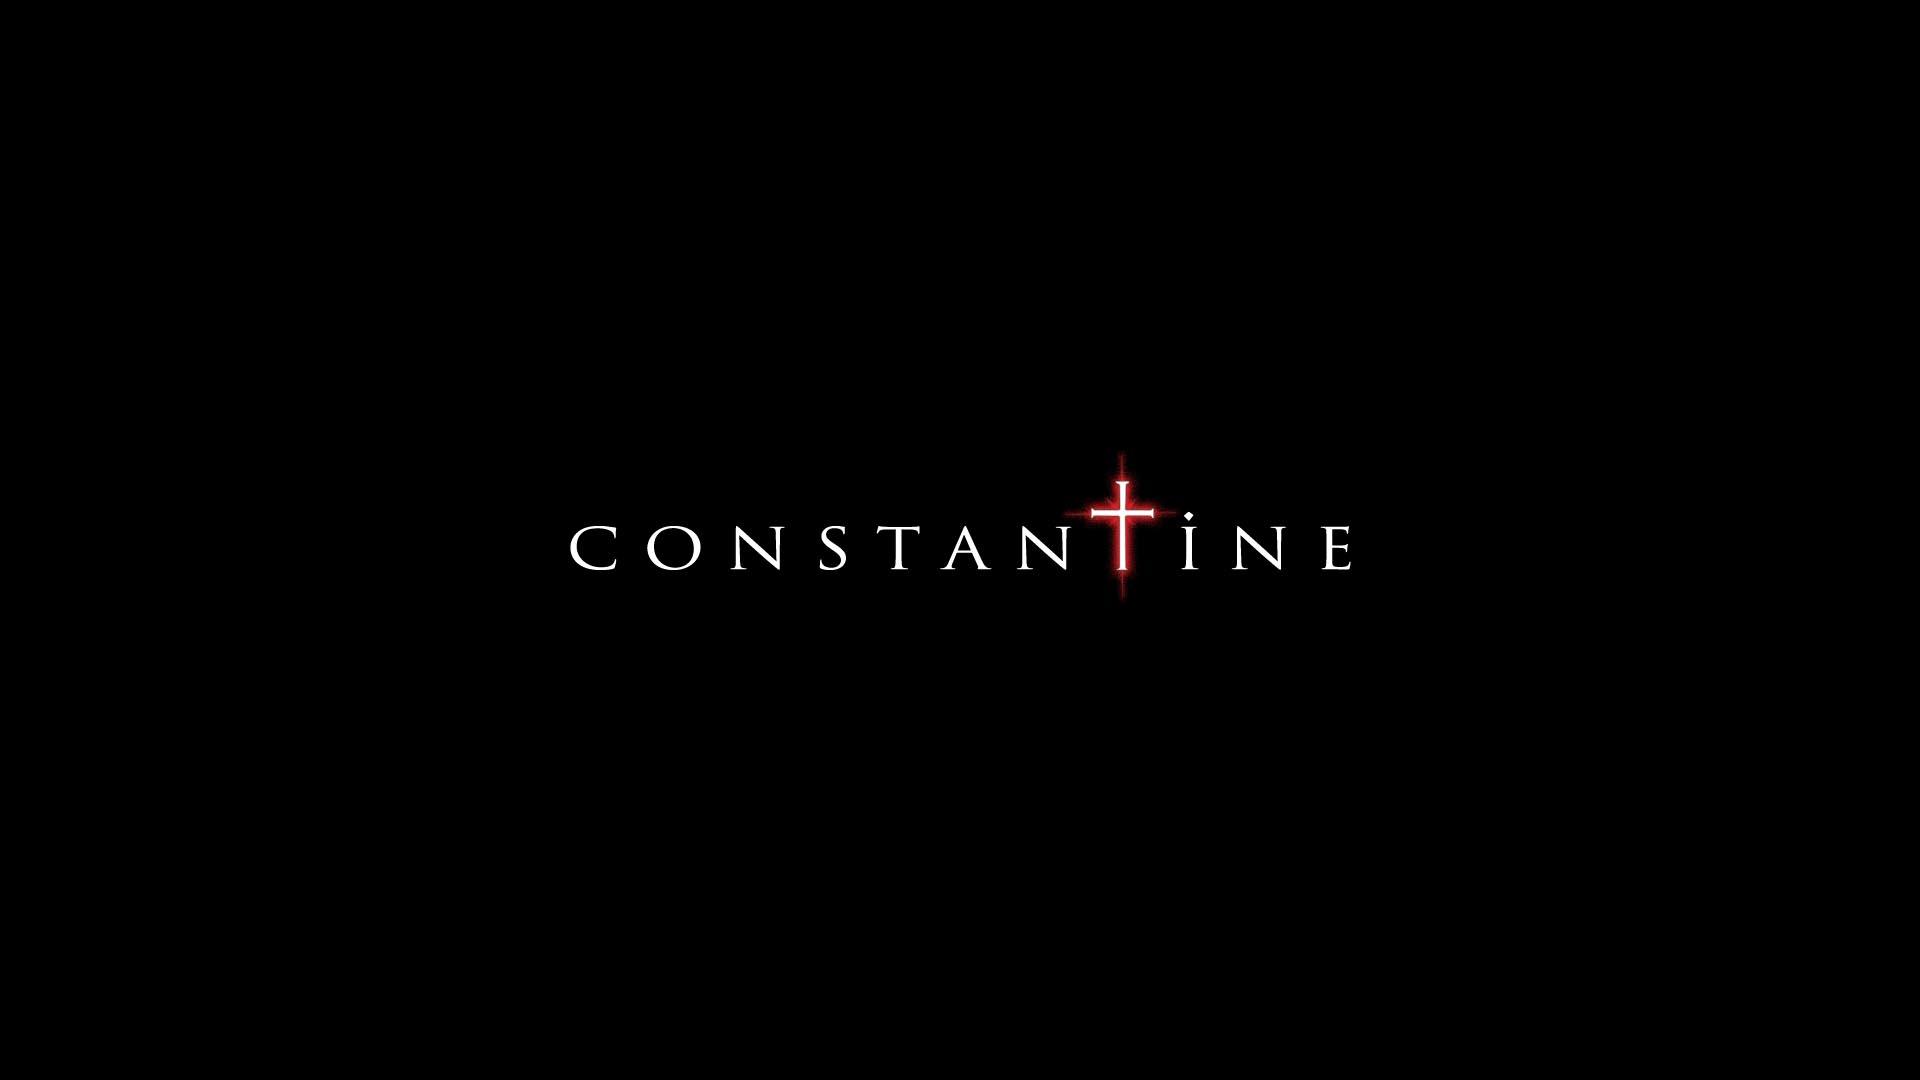 Constantine Fondo De Pantalla Hd Fondo De Escritorio